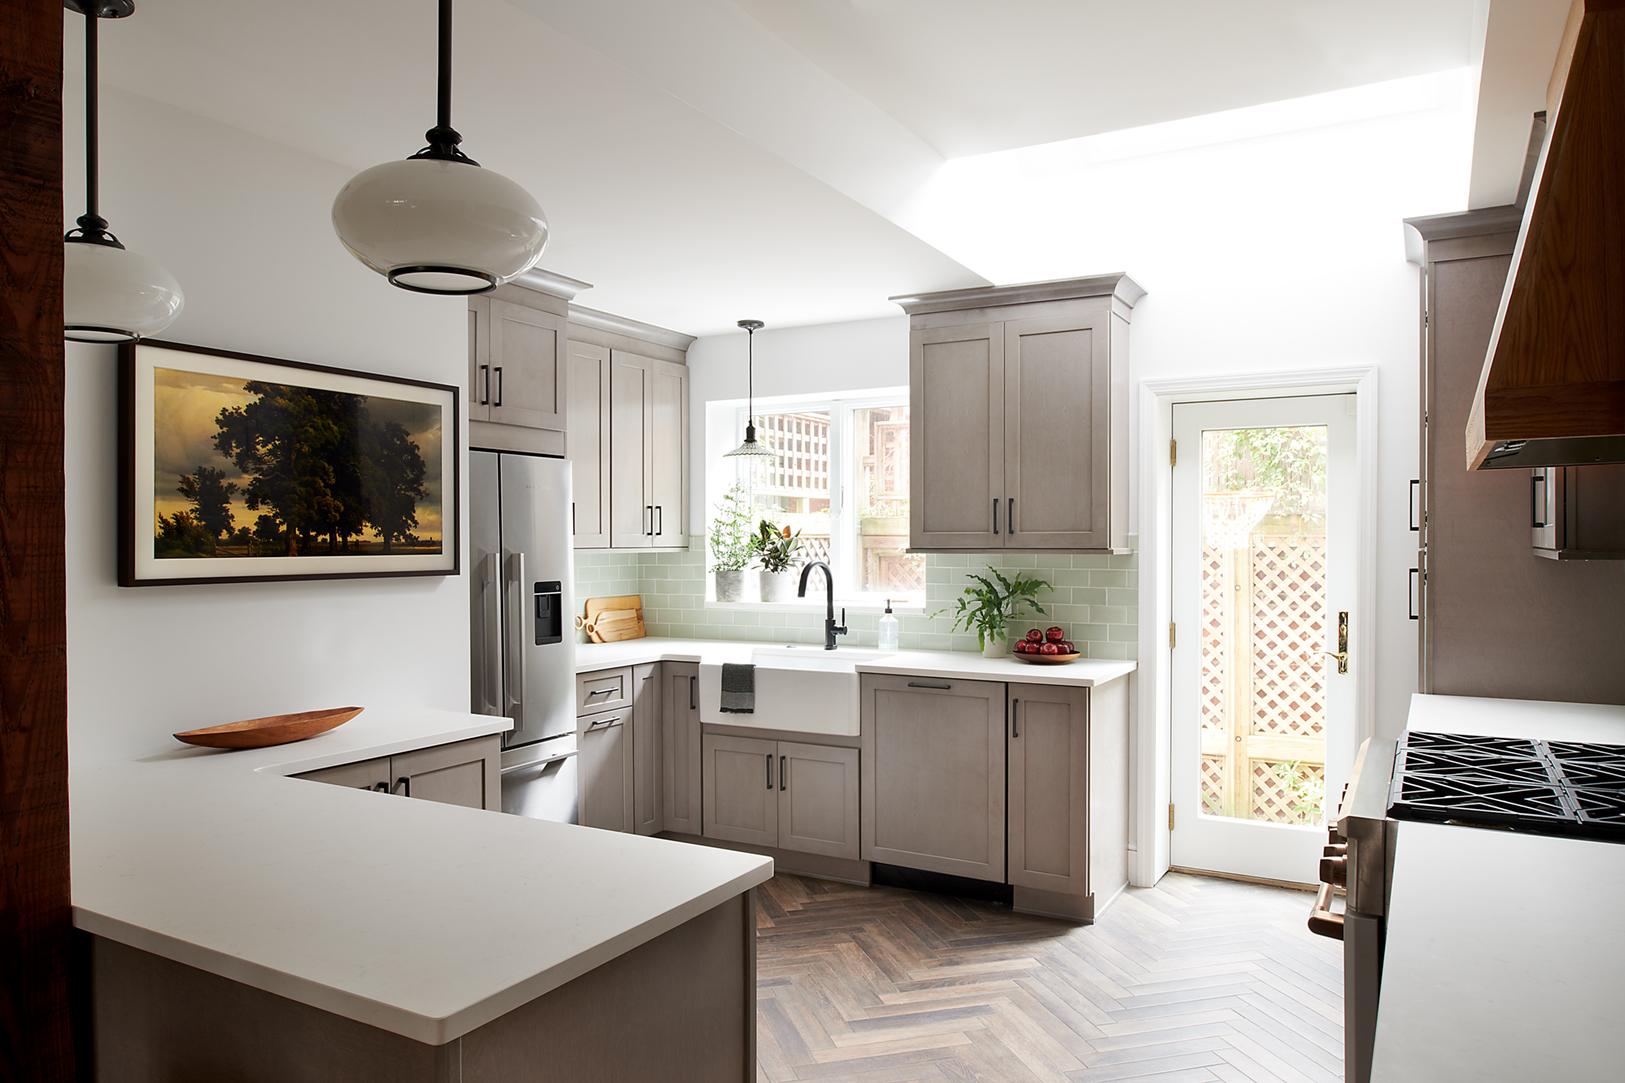 rittenhouse_lowres_kitchen_04_v2.jpg